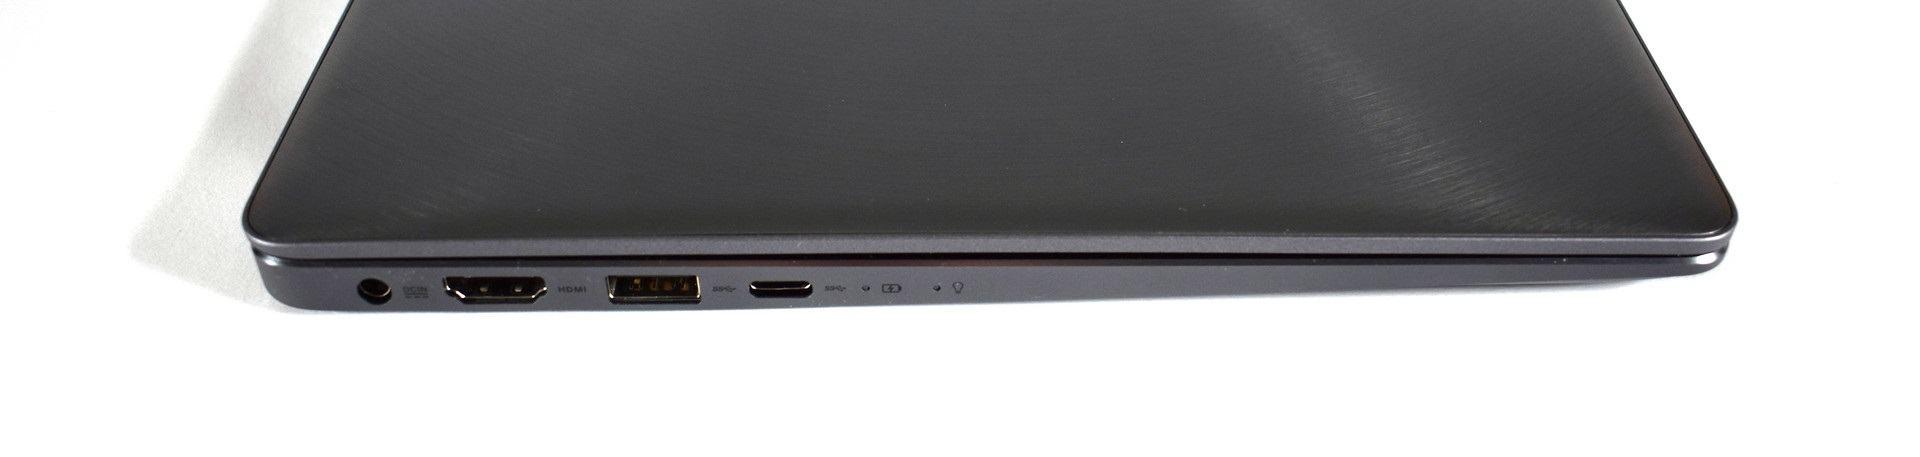 đánh giá laptop Asus ZenBook UX331UN